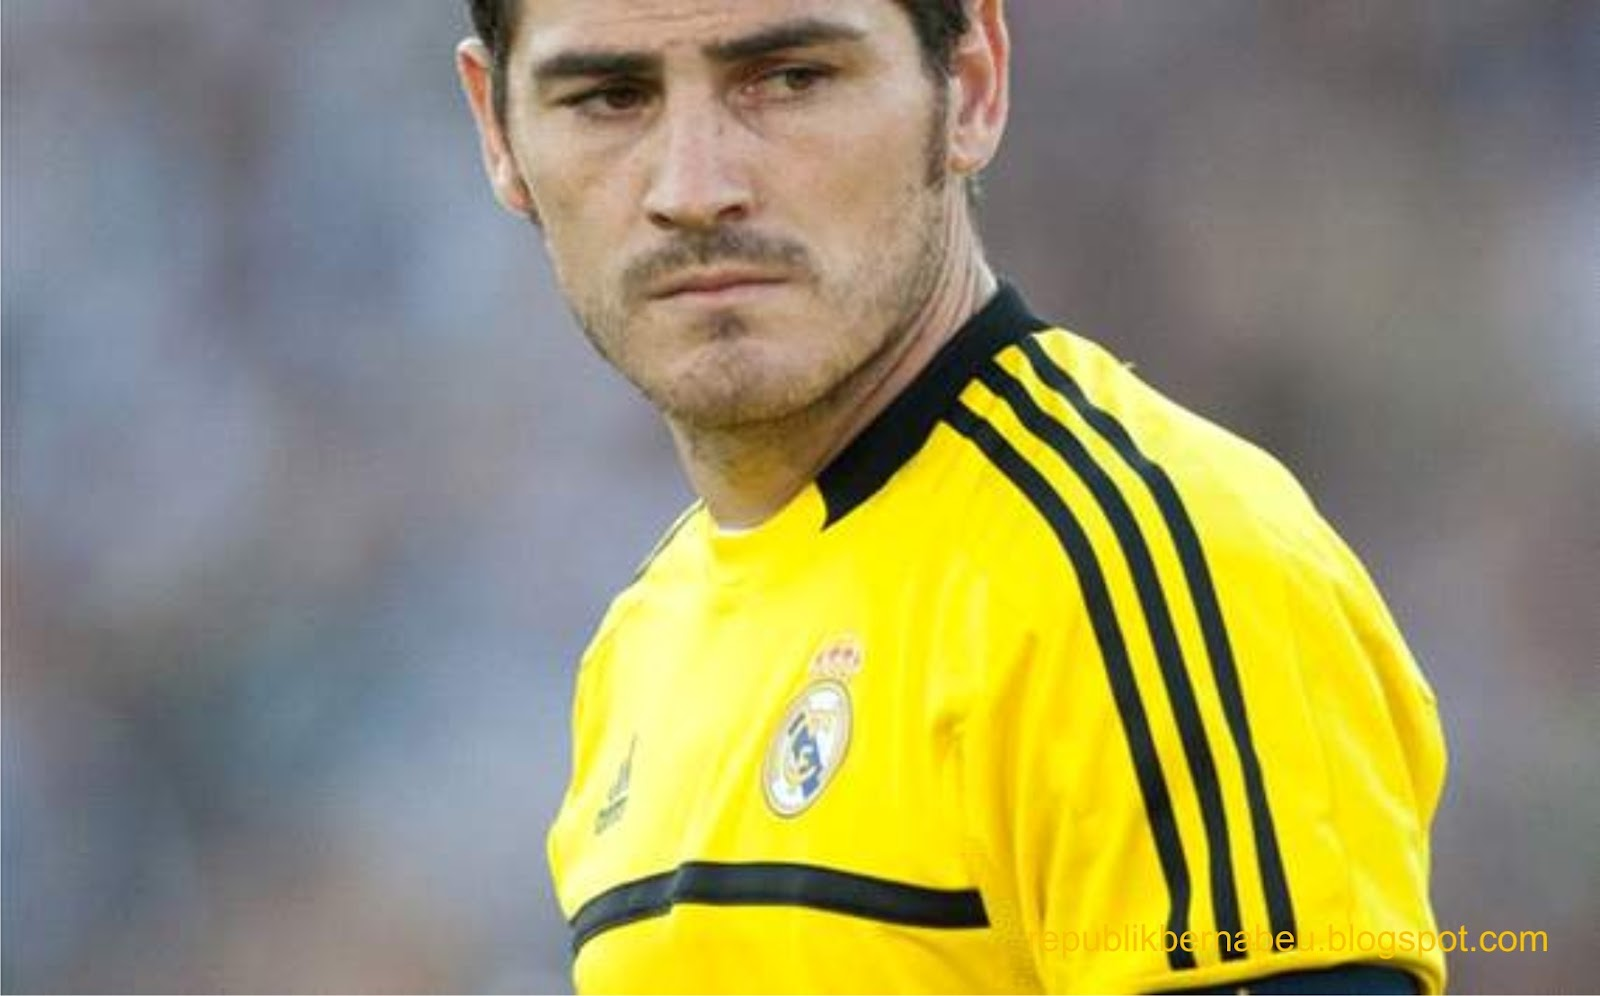 http://4.bp.blogspot.com/-eo25IfbZqP4/T5OA6emrMMI/AAAAAAAABFA/LBzyyNVYlrc/s1600/Iker+Casillas+Cristiano+bermain+luar+biasa,.jpg